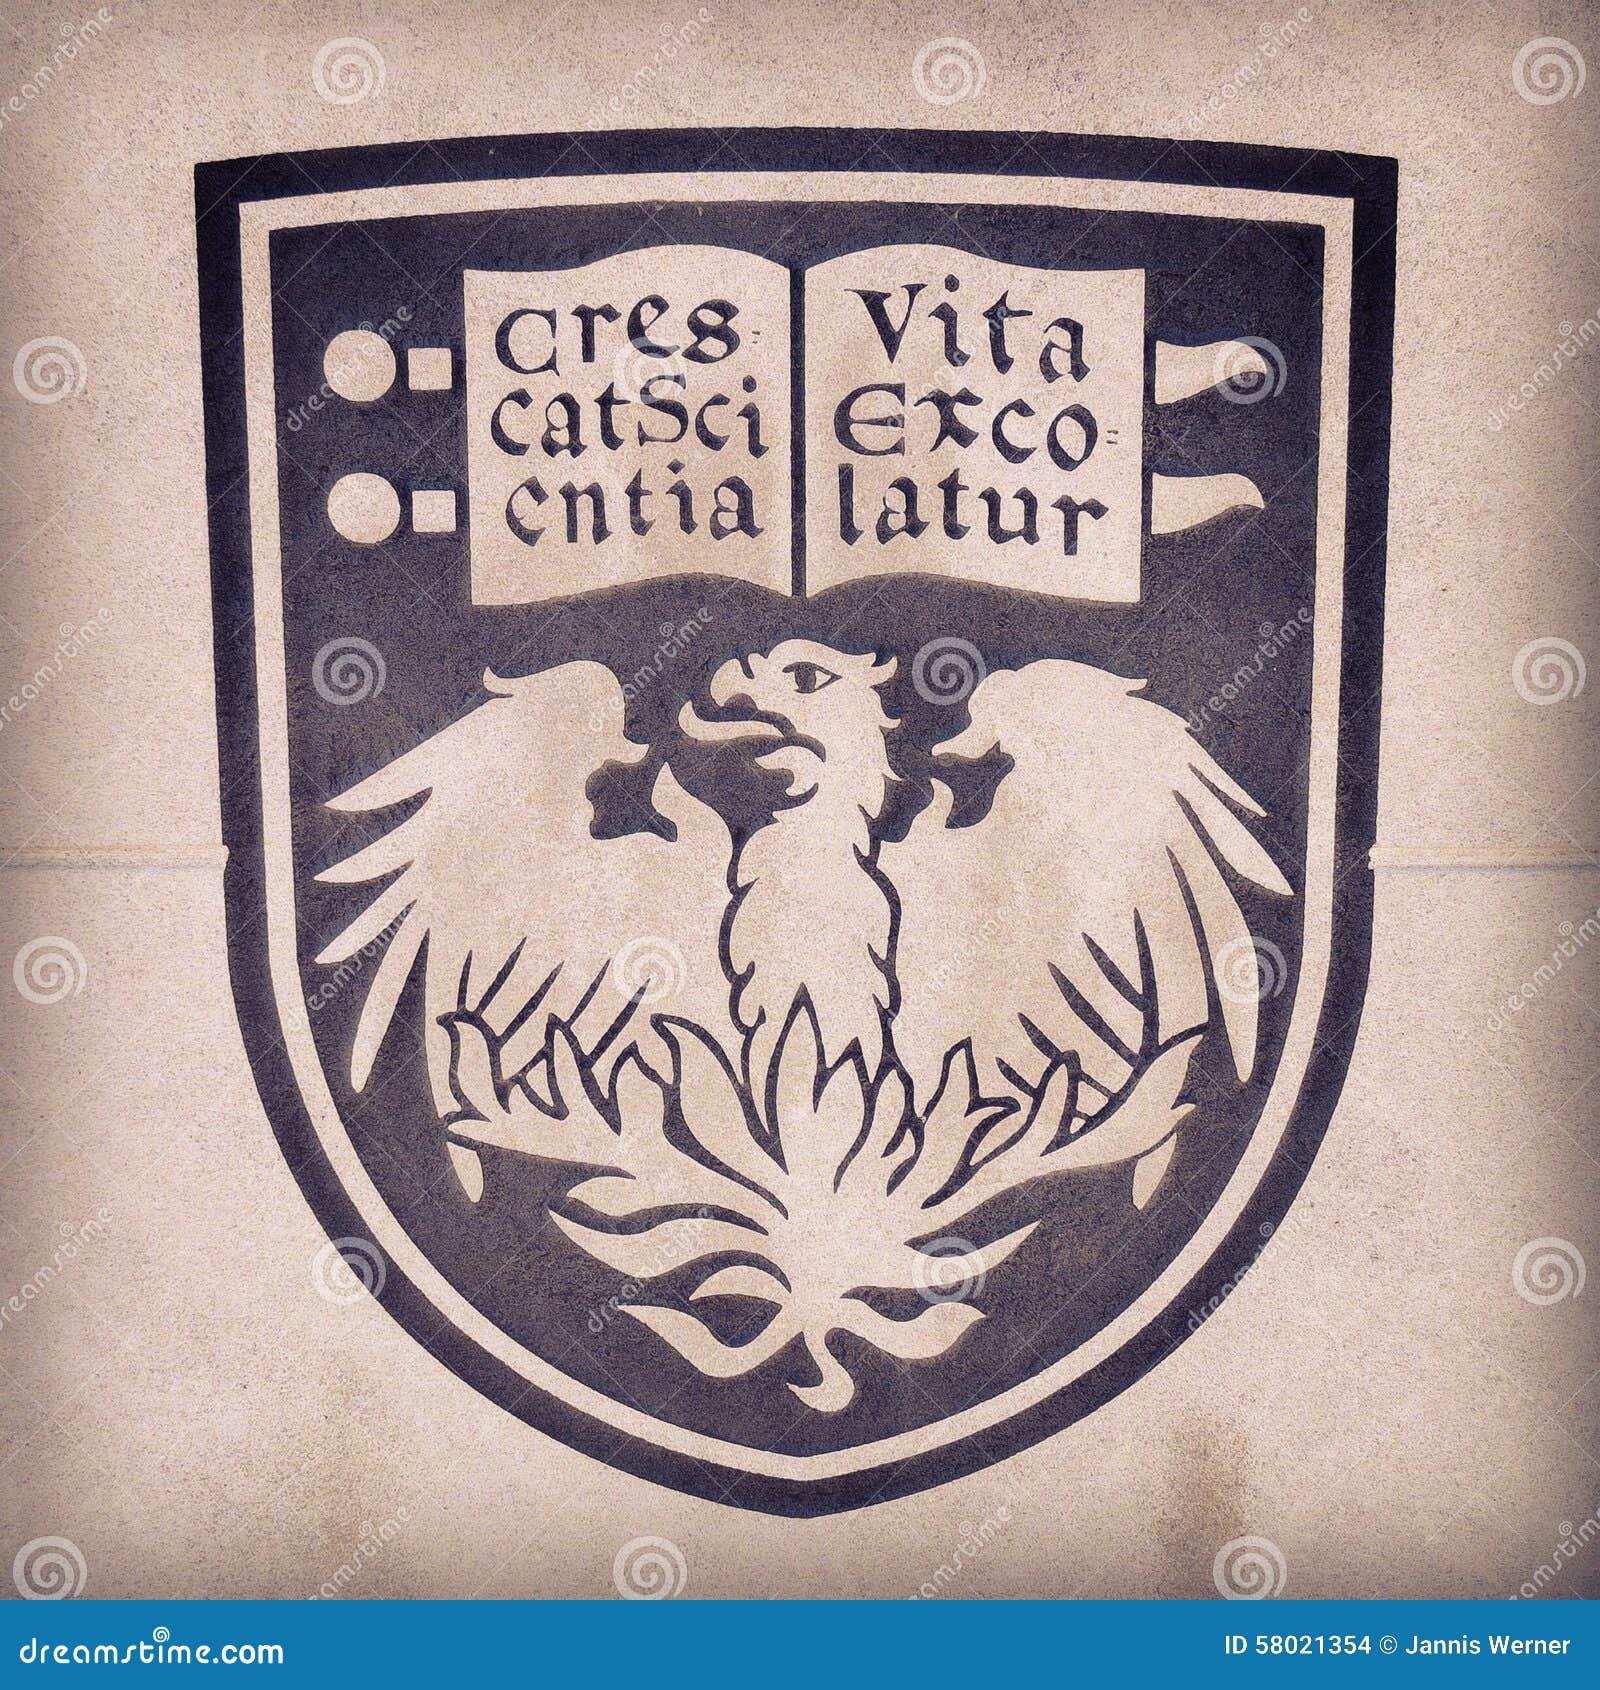 University of Chicago Crest